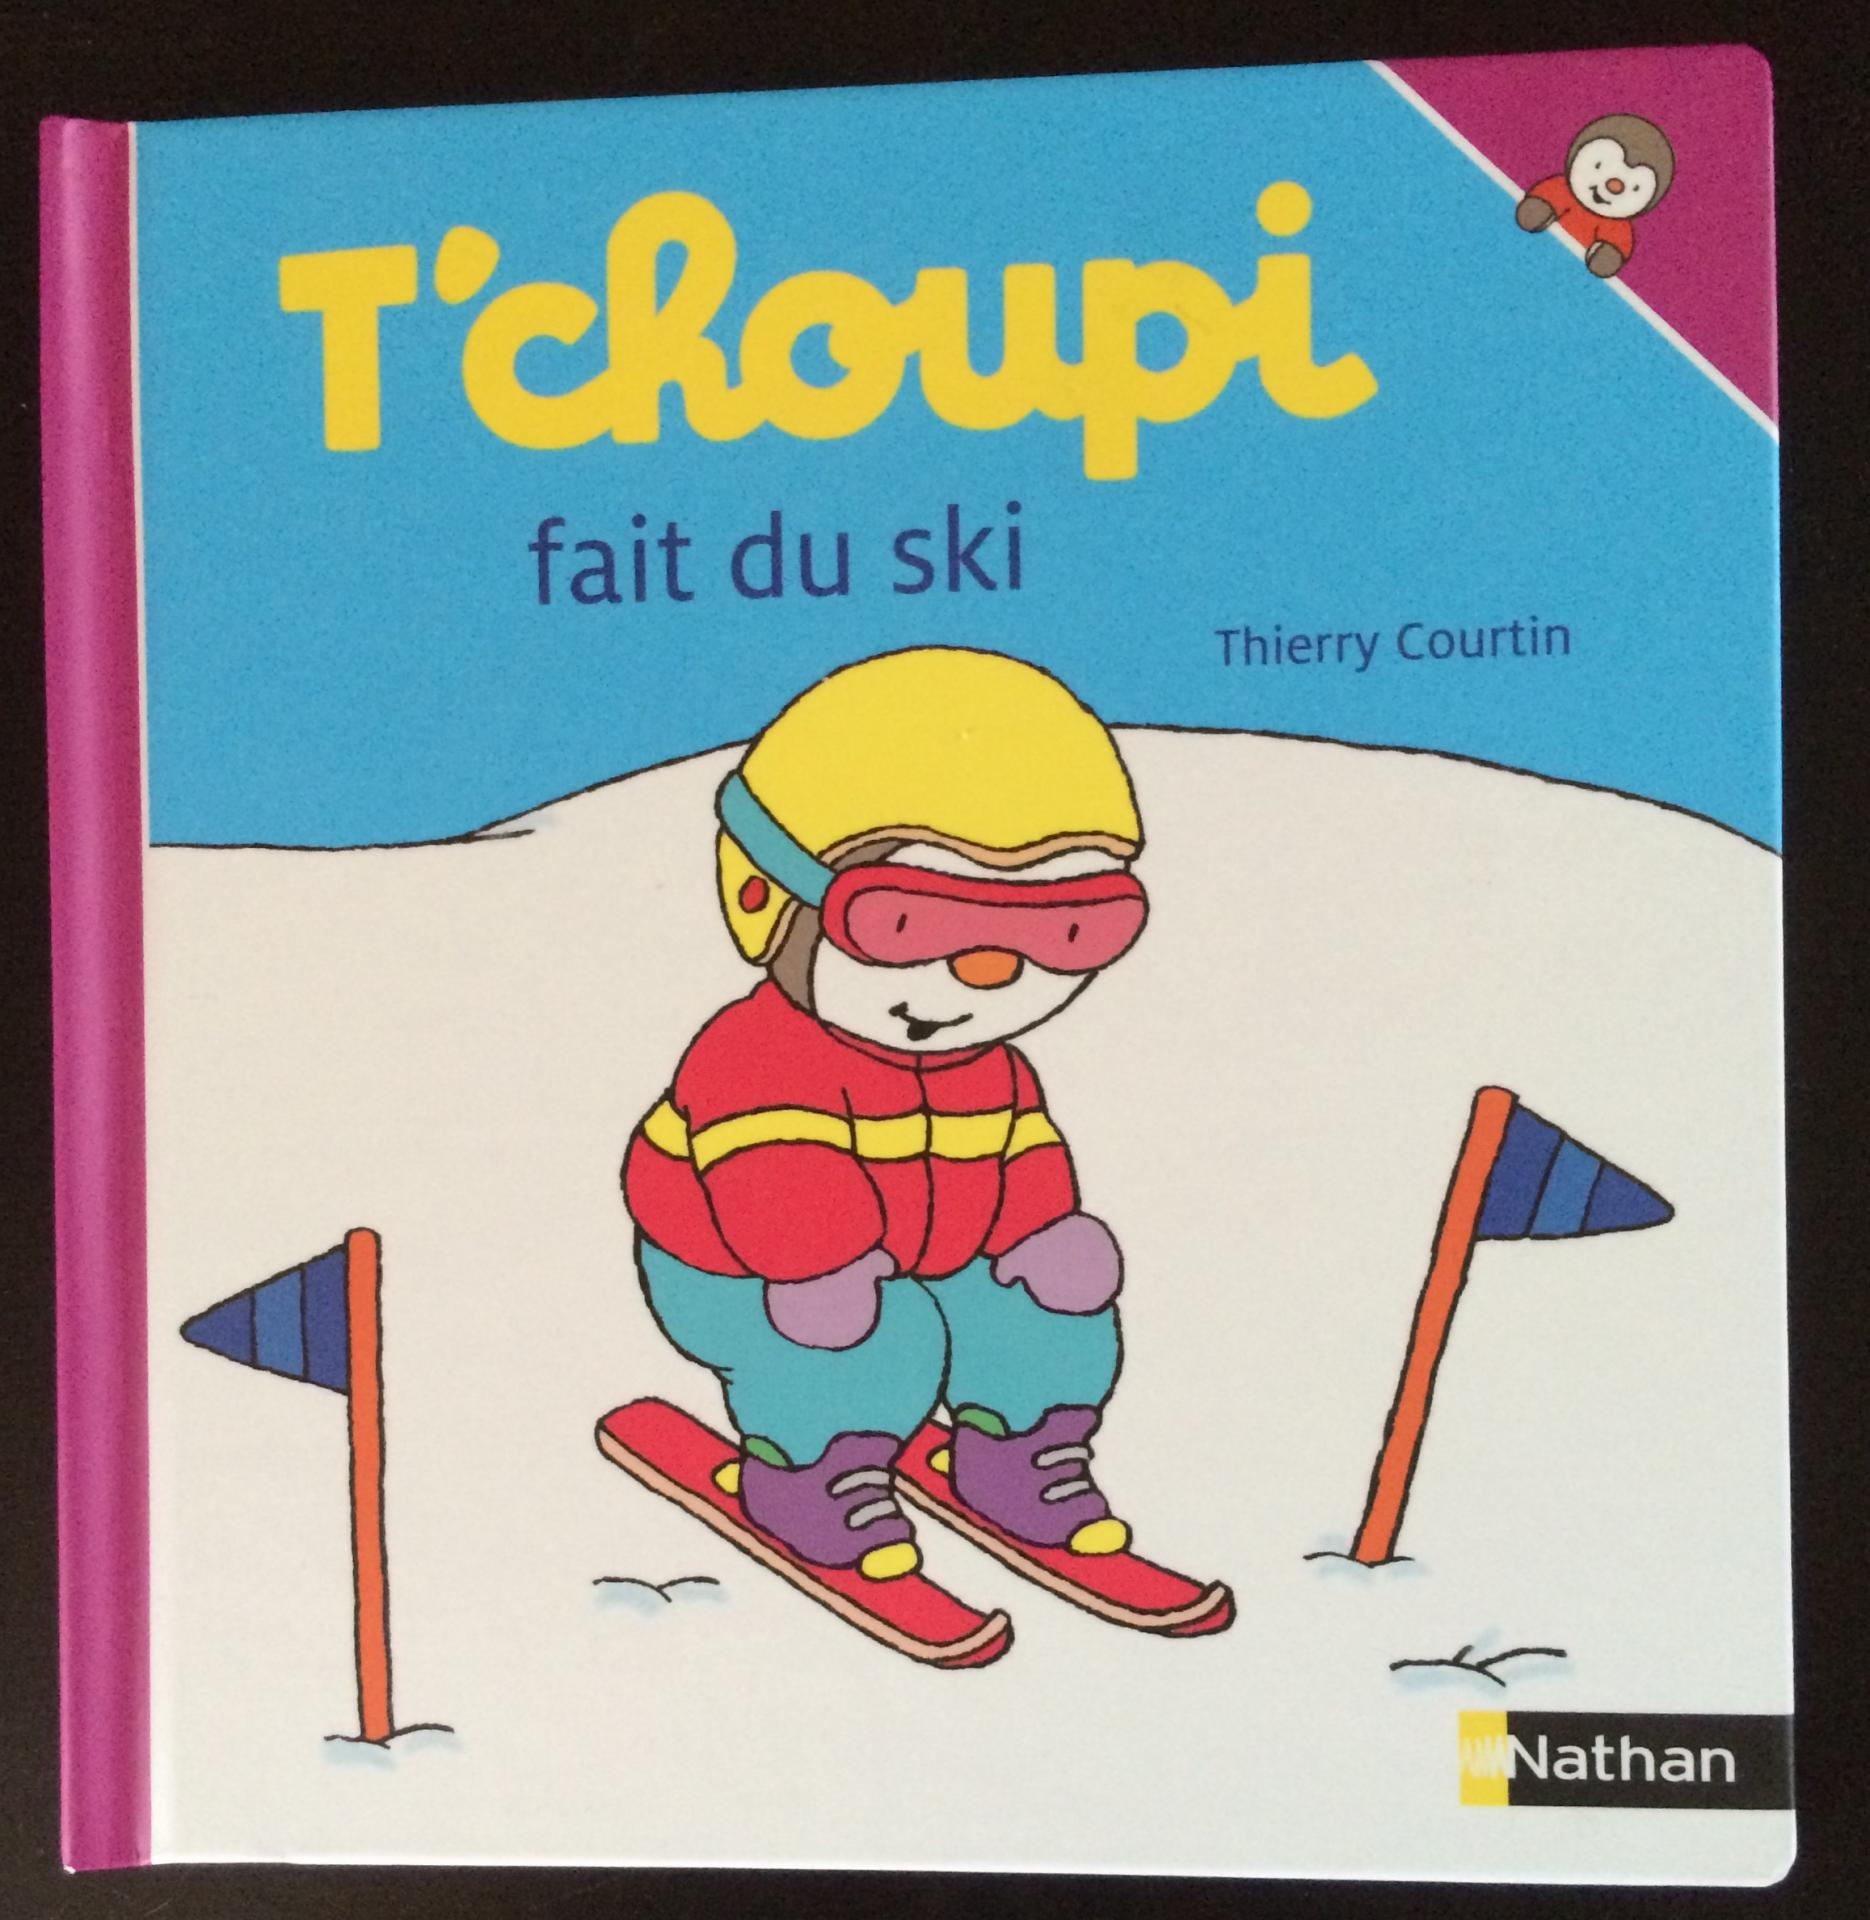 T'choupi fait du skide Thierry Courtin.